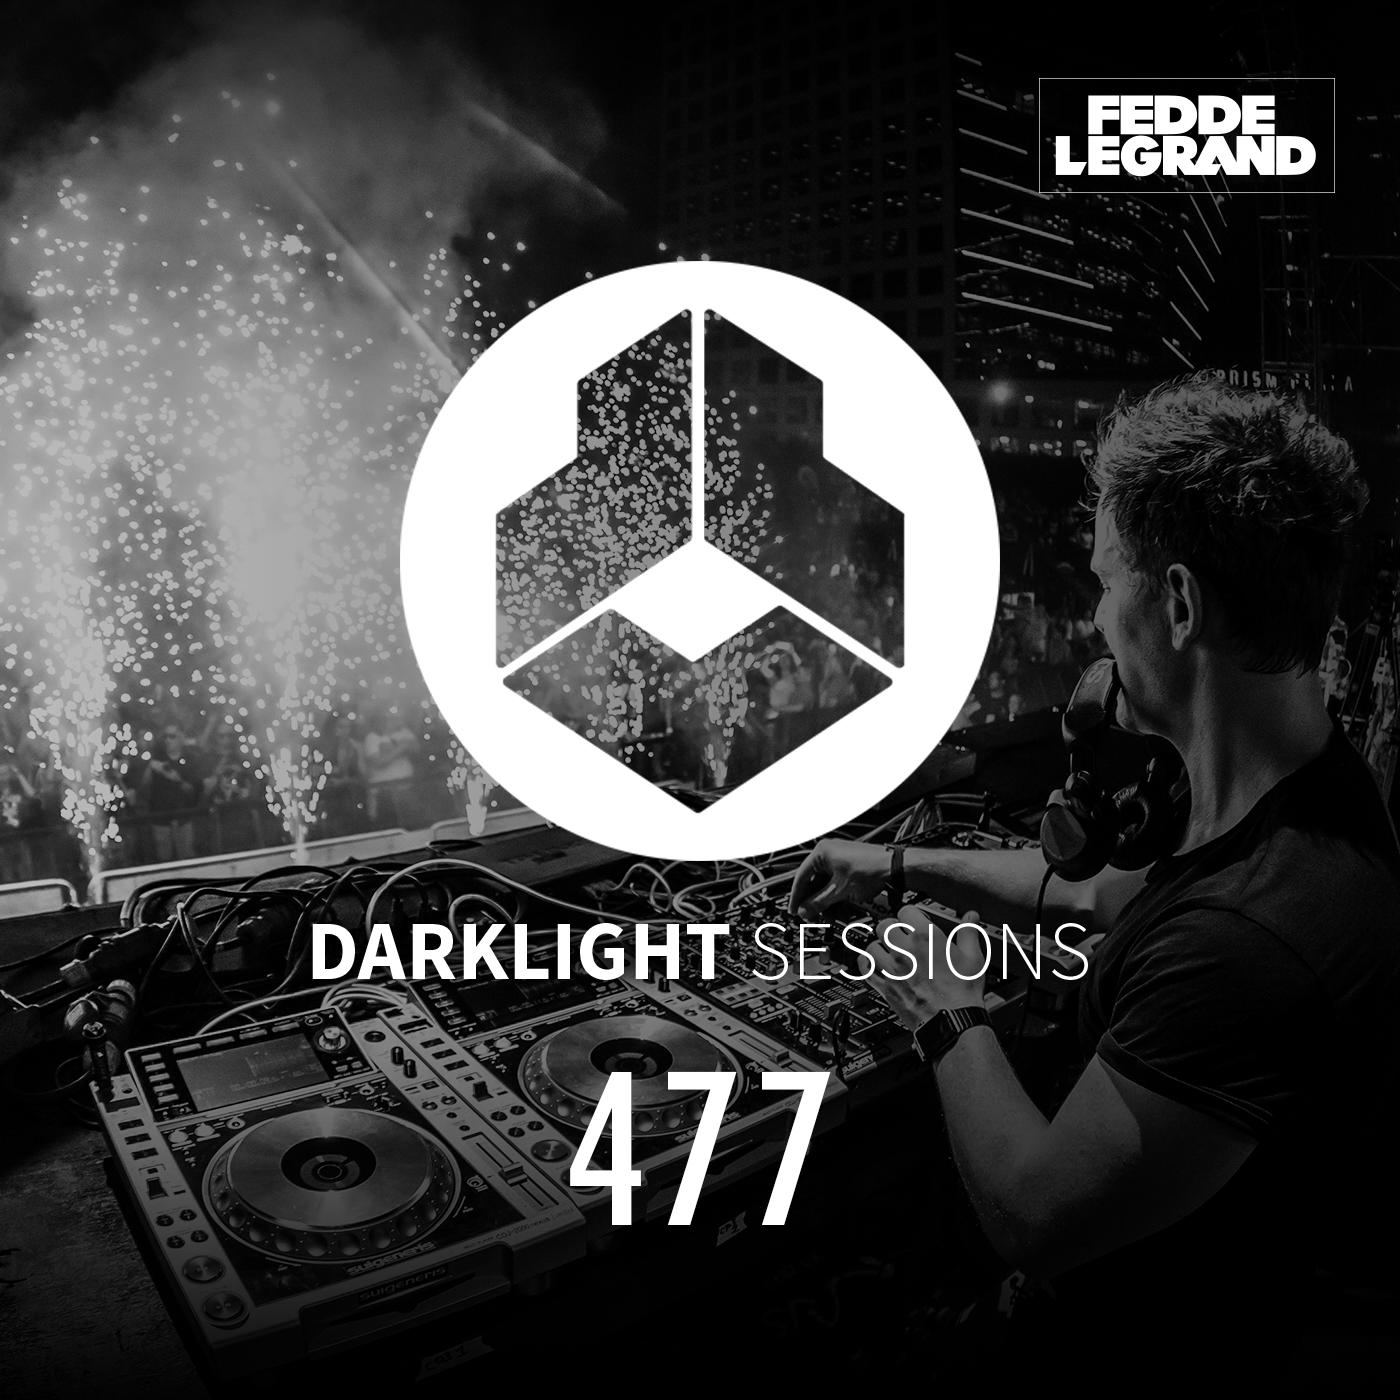 Darklight Sessions 477